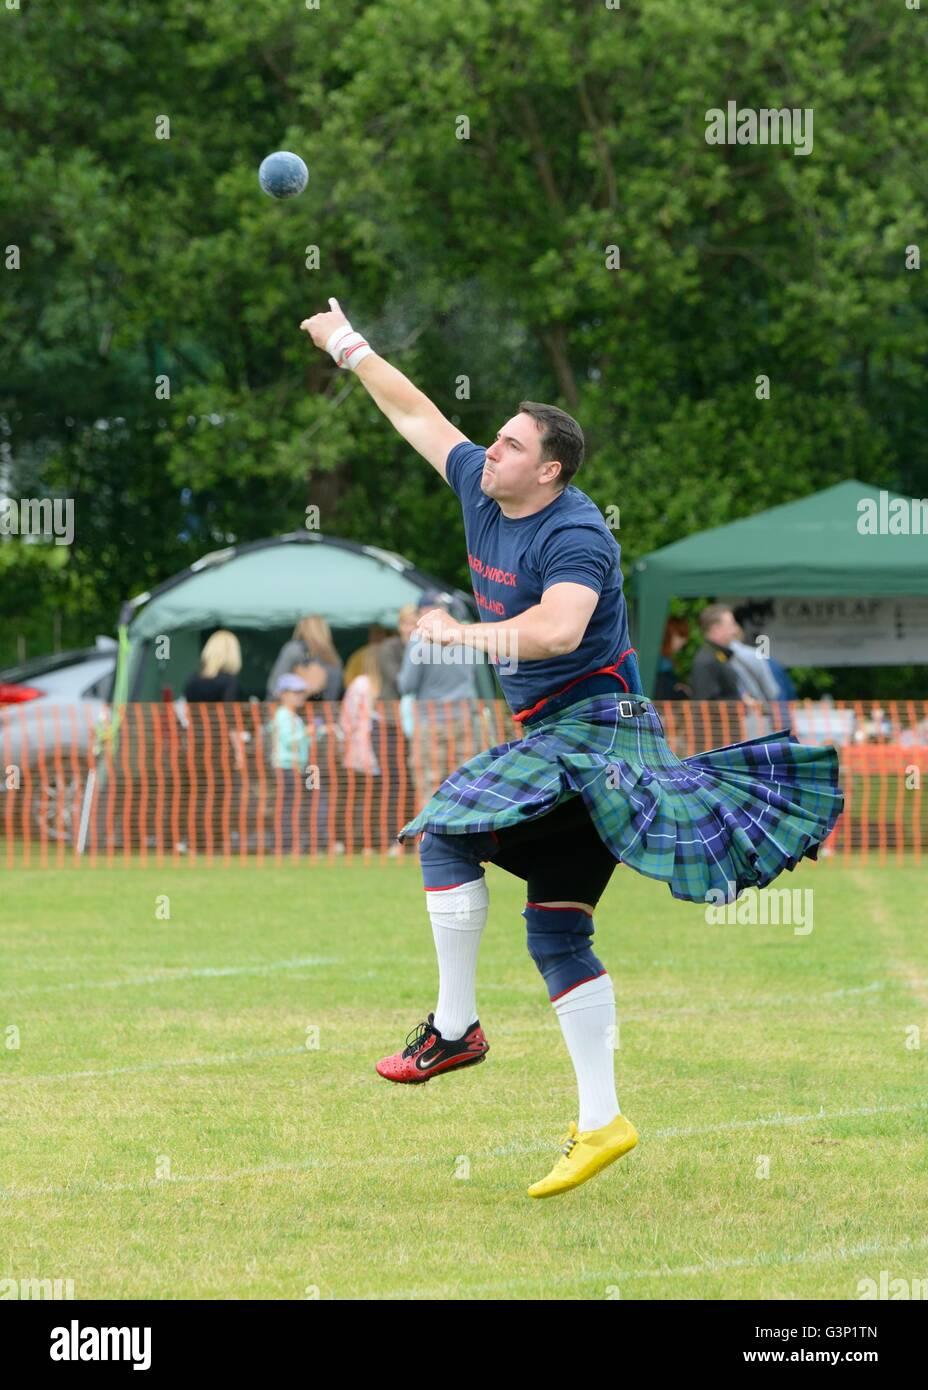 Man in kilt shot putting at Highland Games, Scotland, UK - Stock Image